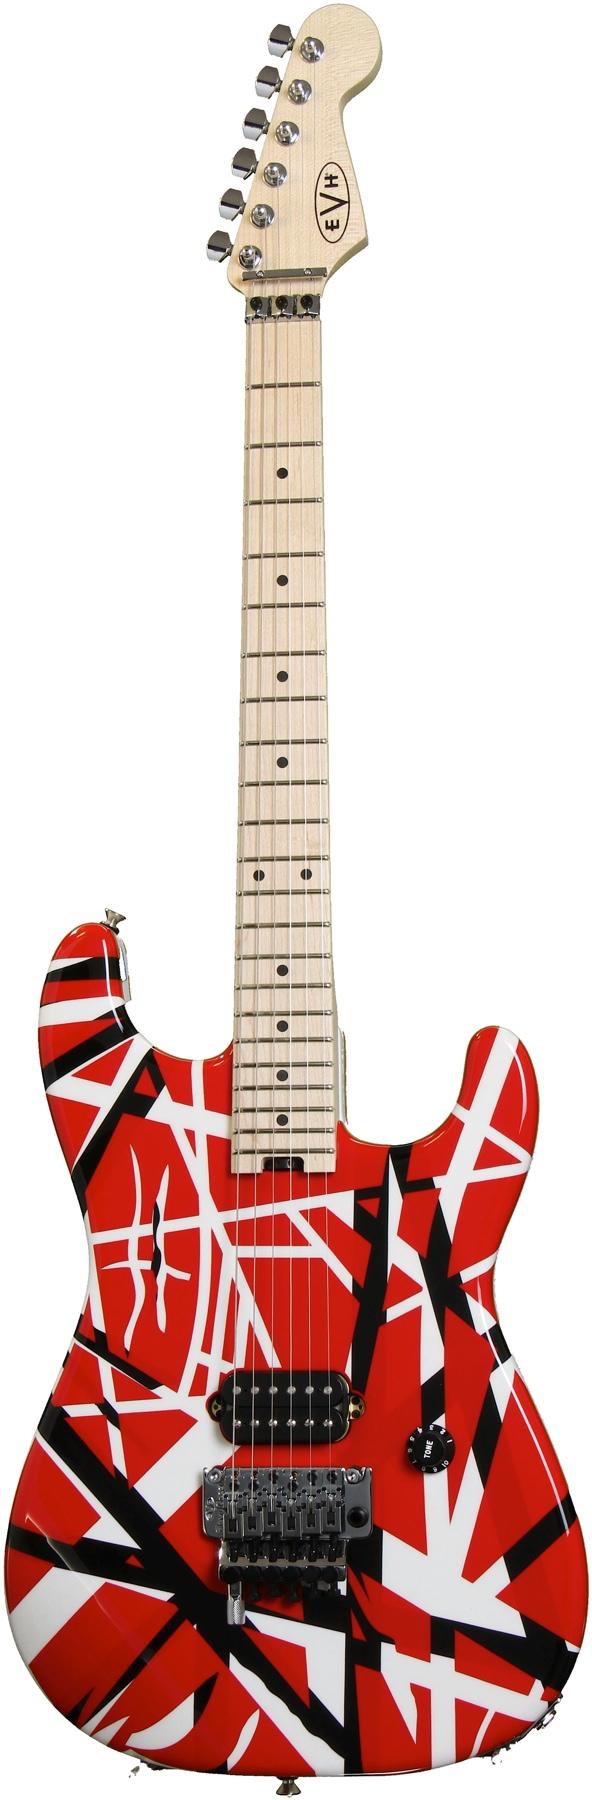 Evh Striped Series Red W Black Stripes Guitar Collection Eddie Van Halen Guitar